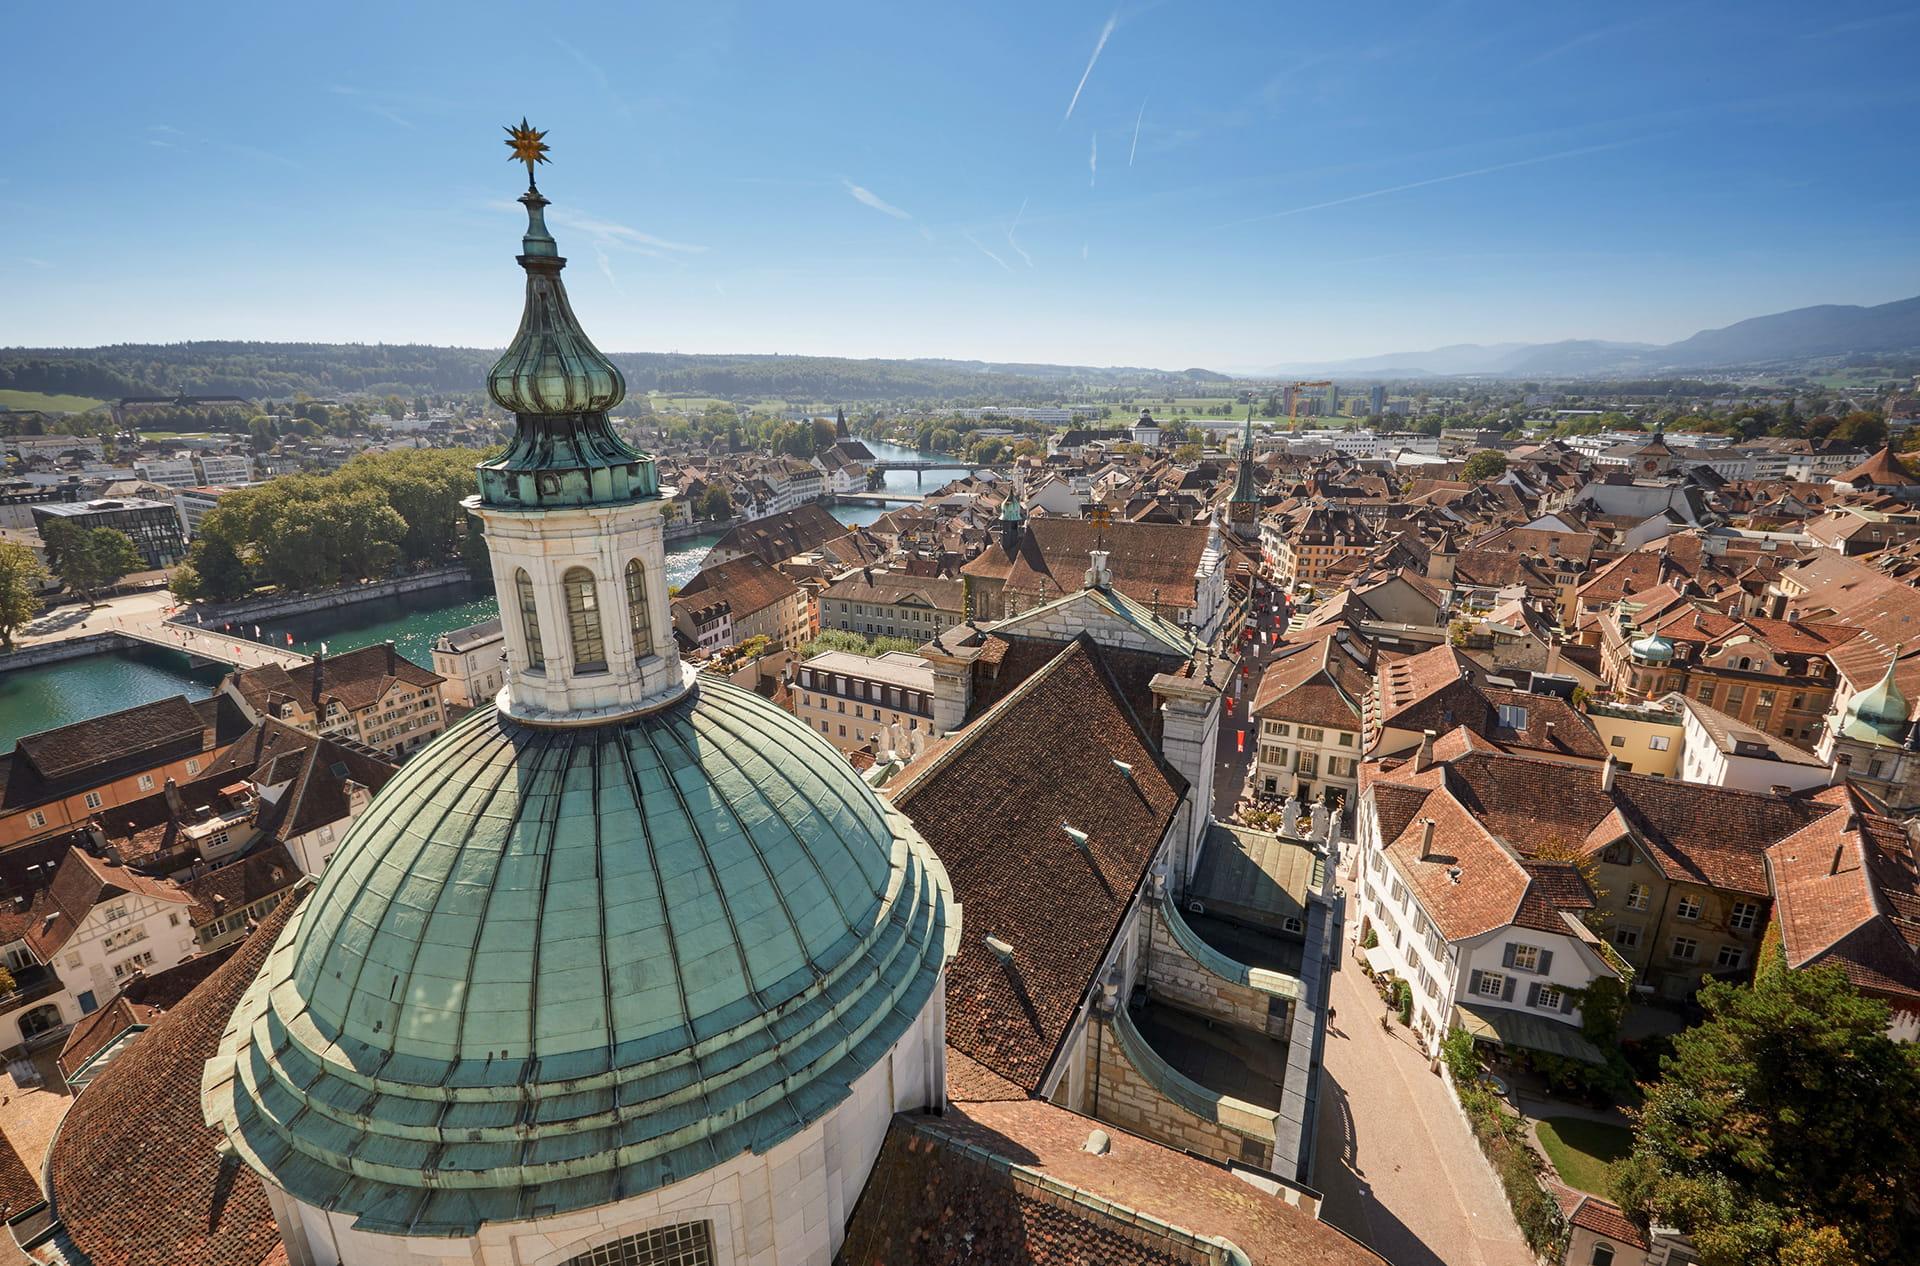 St.-Ursen-Kathedrale